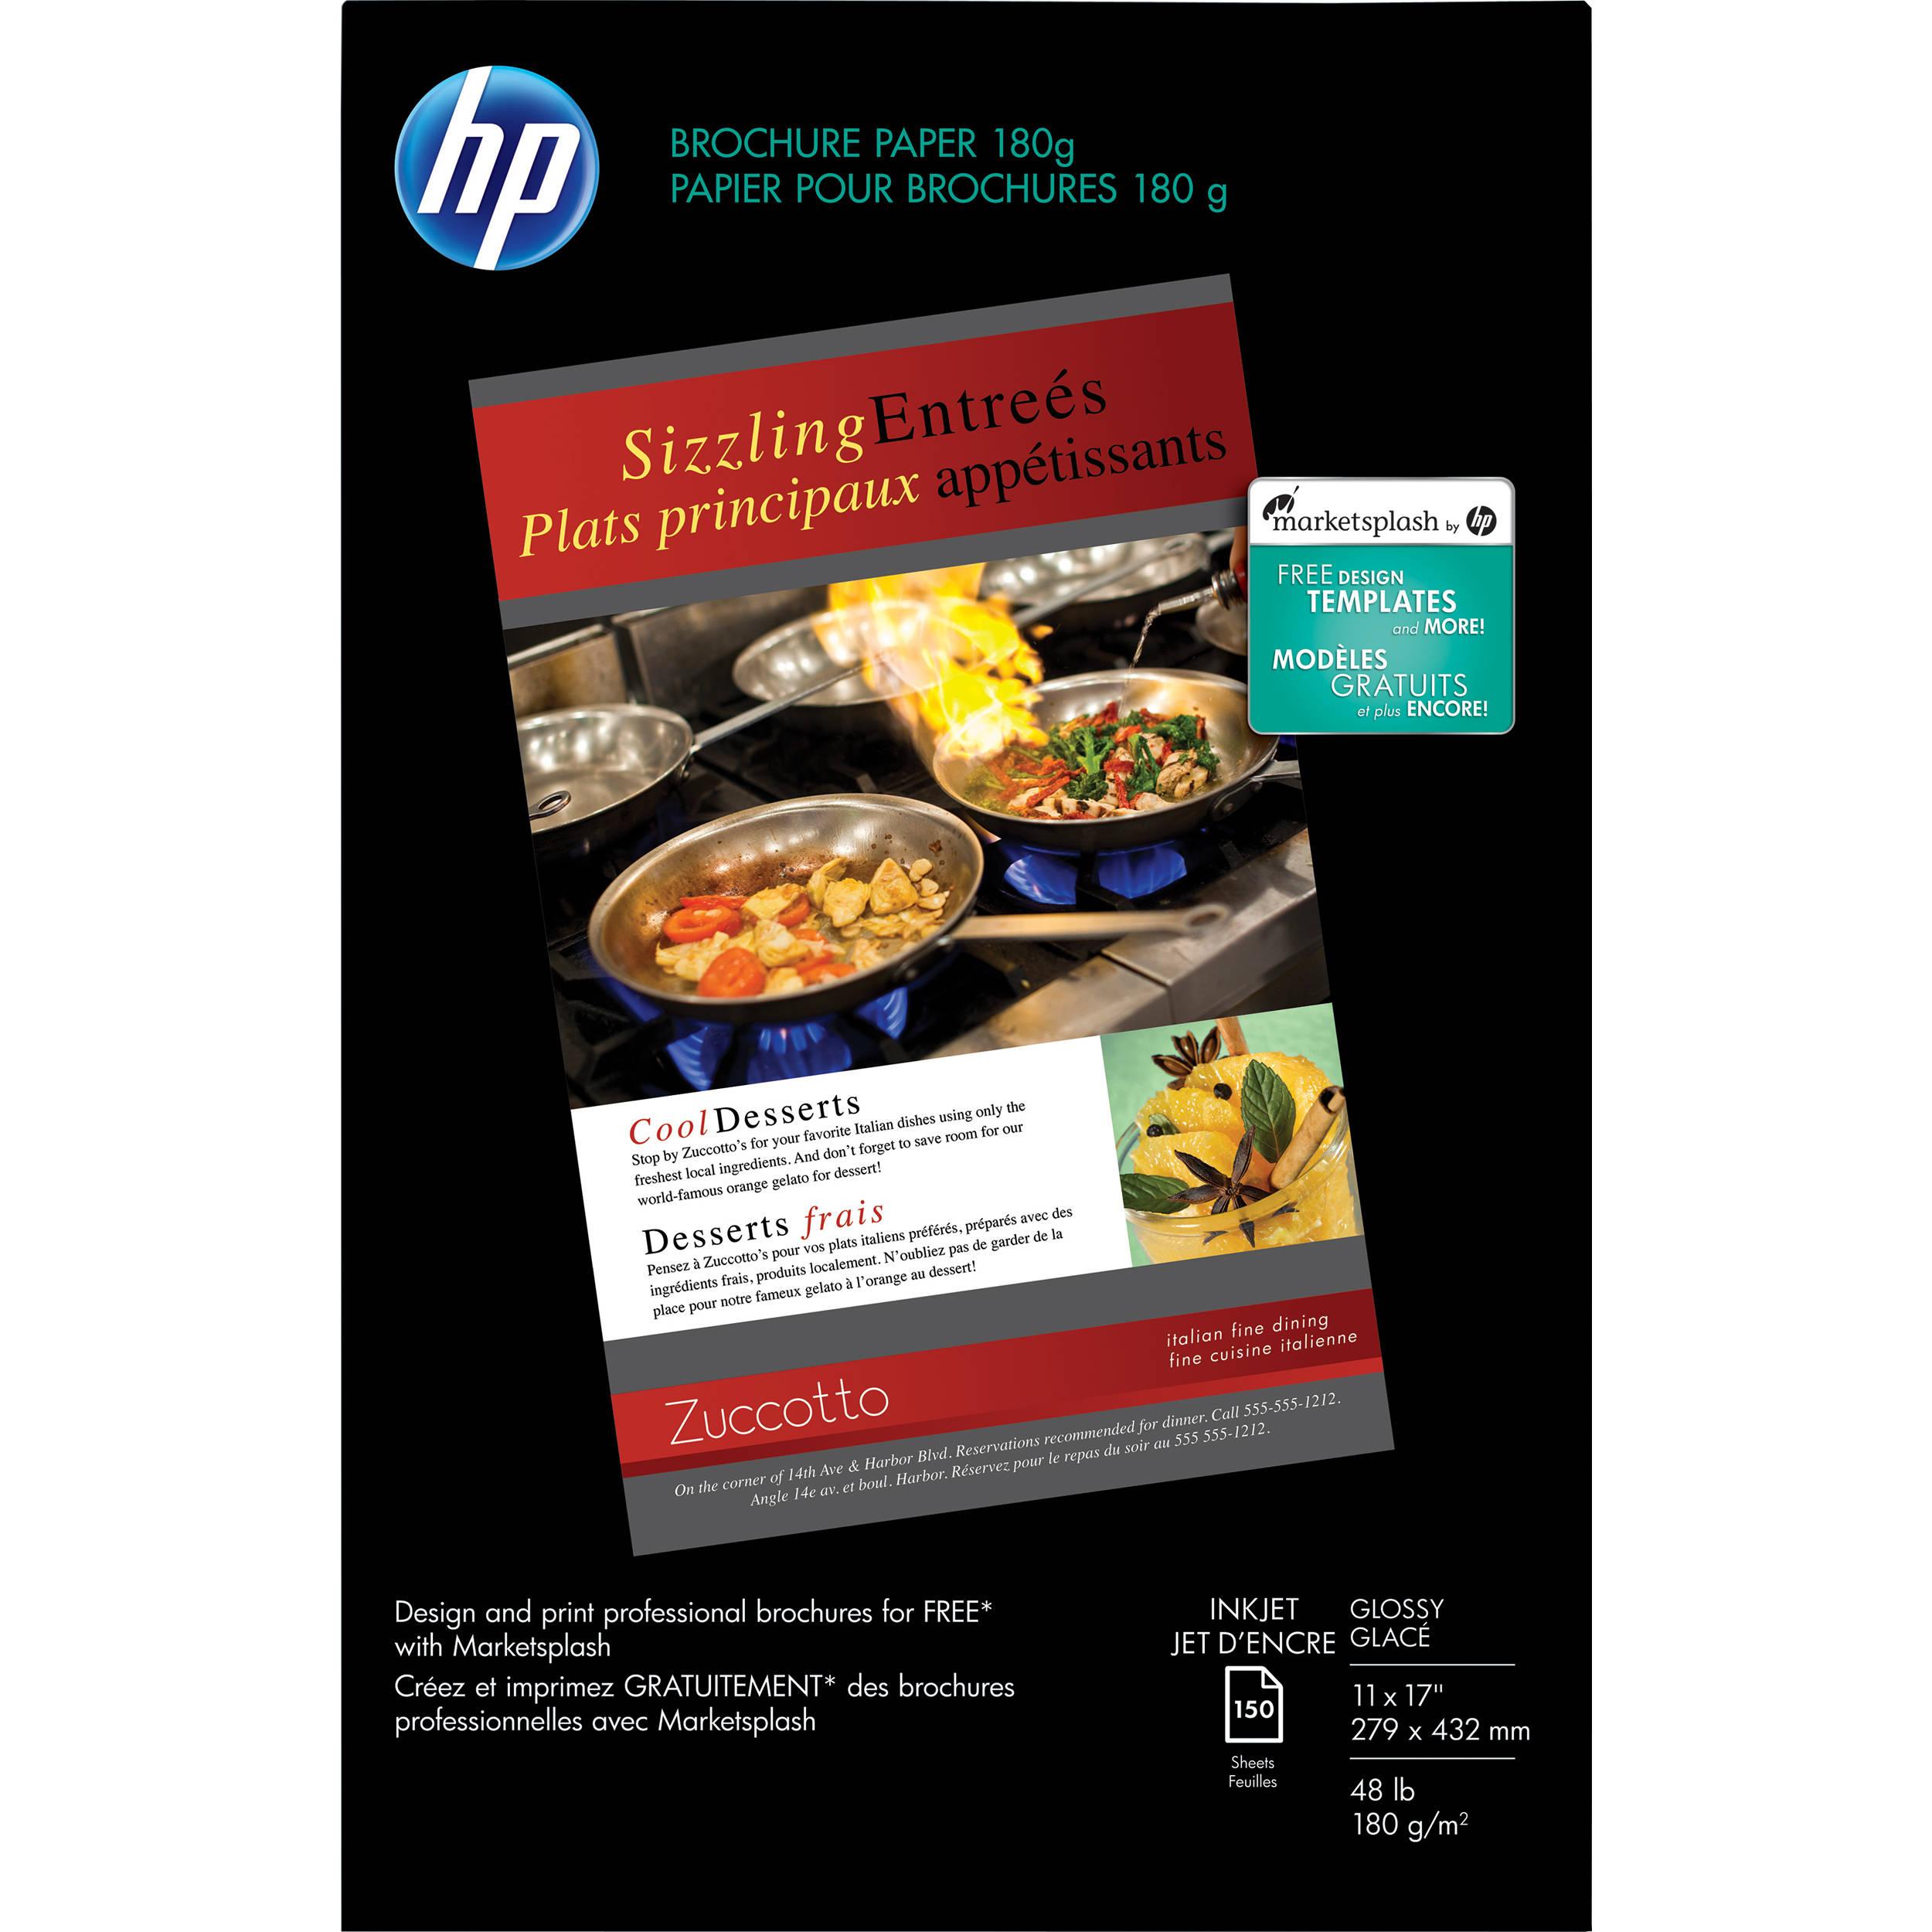 50 Sheets 8.5x11 HP Brochure Paper Matte